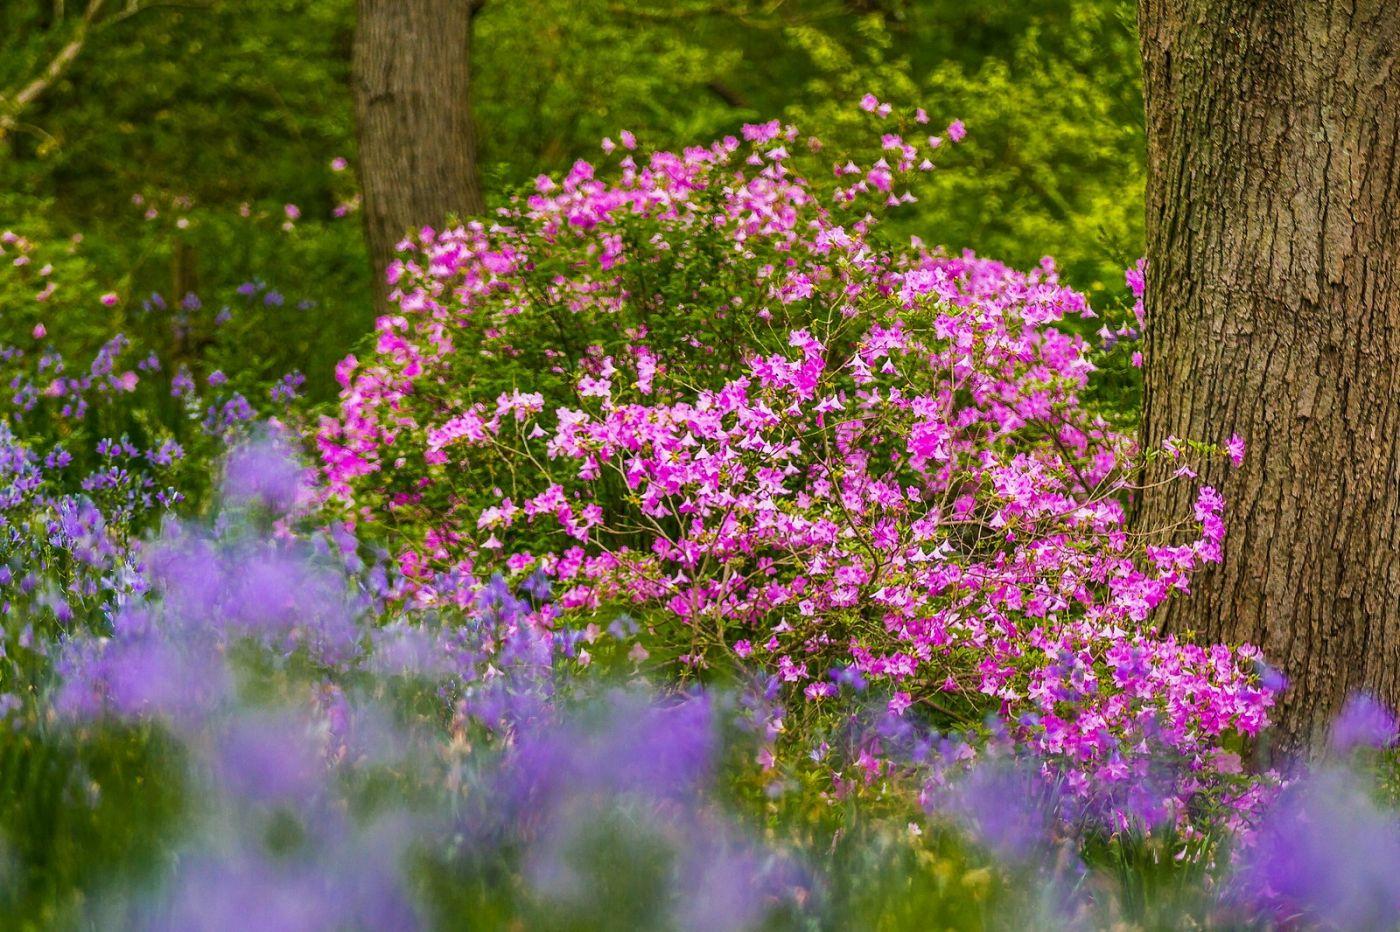 Chanticleer花园,有梦想的季节_图1-35